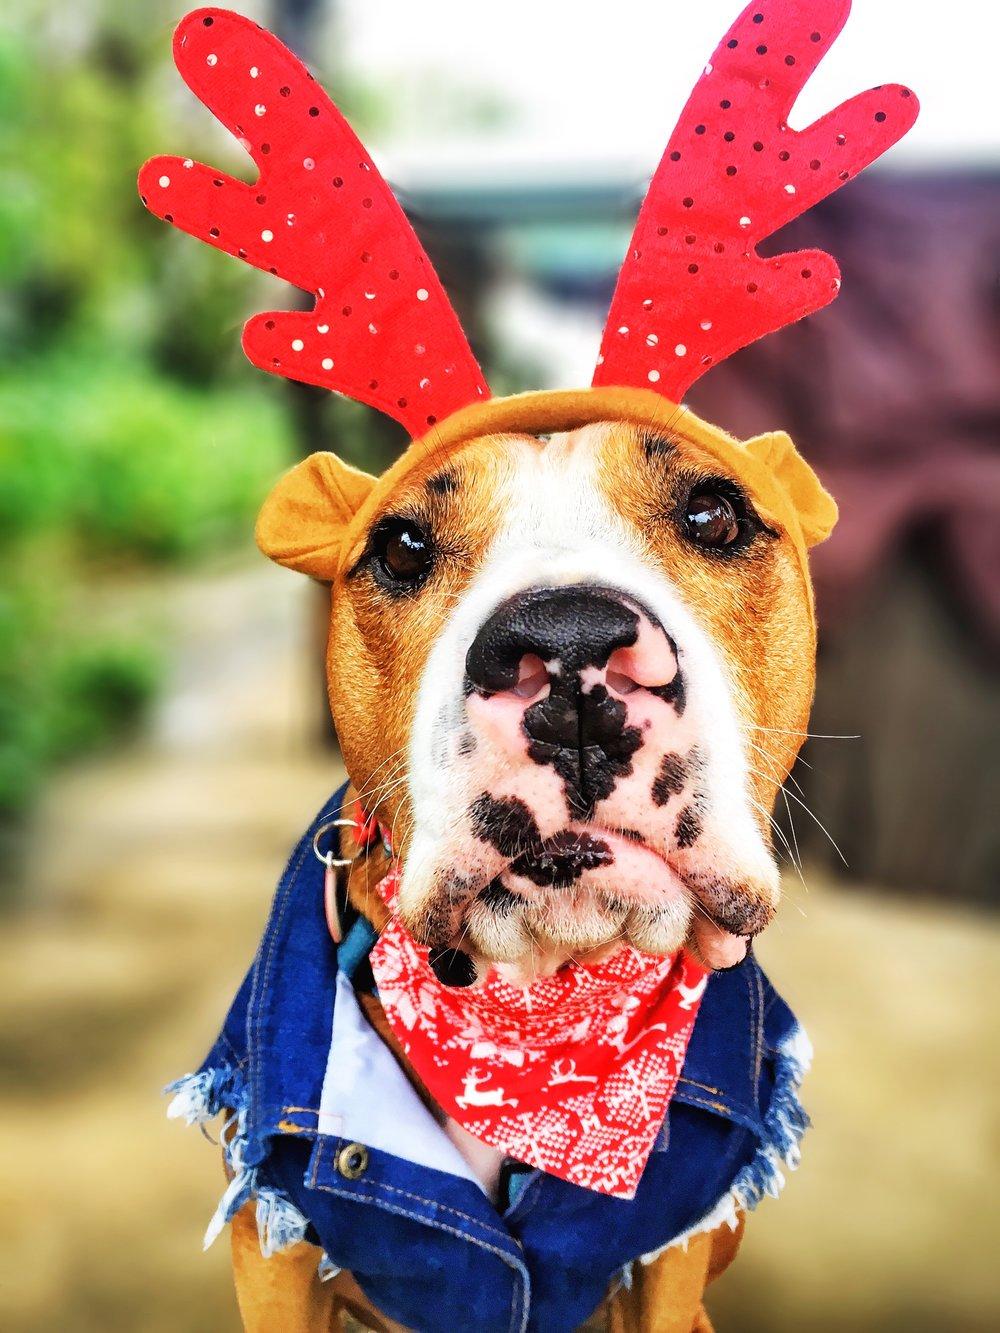 I am so ready for Christmas!